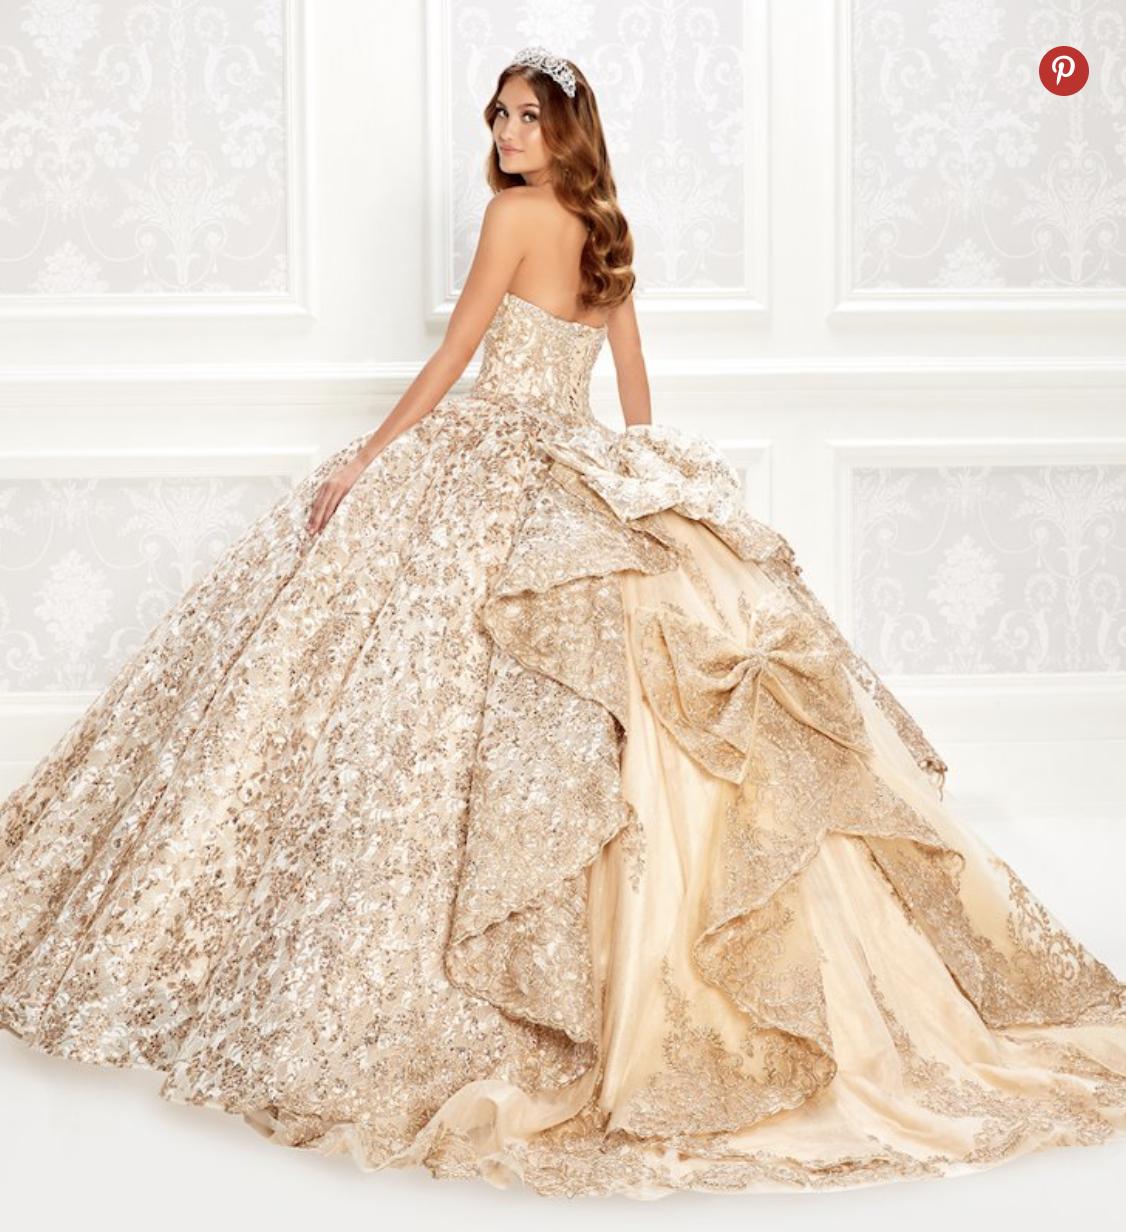 Princesa By Ariana Vara PR22022